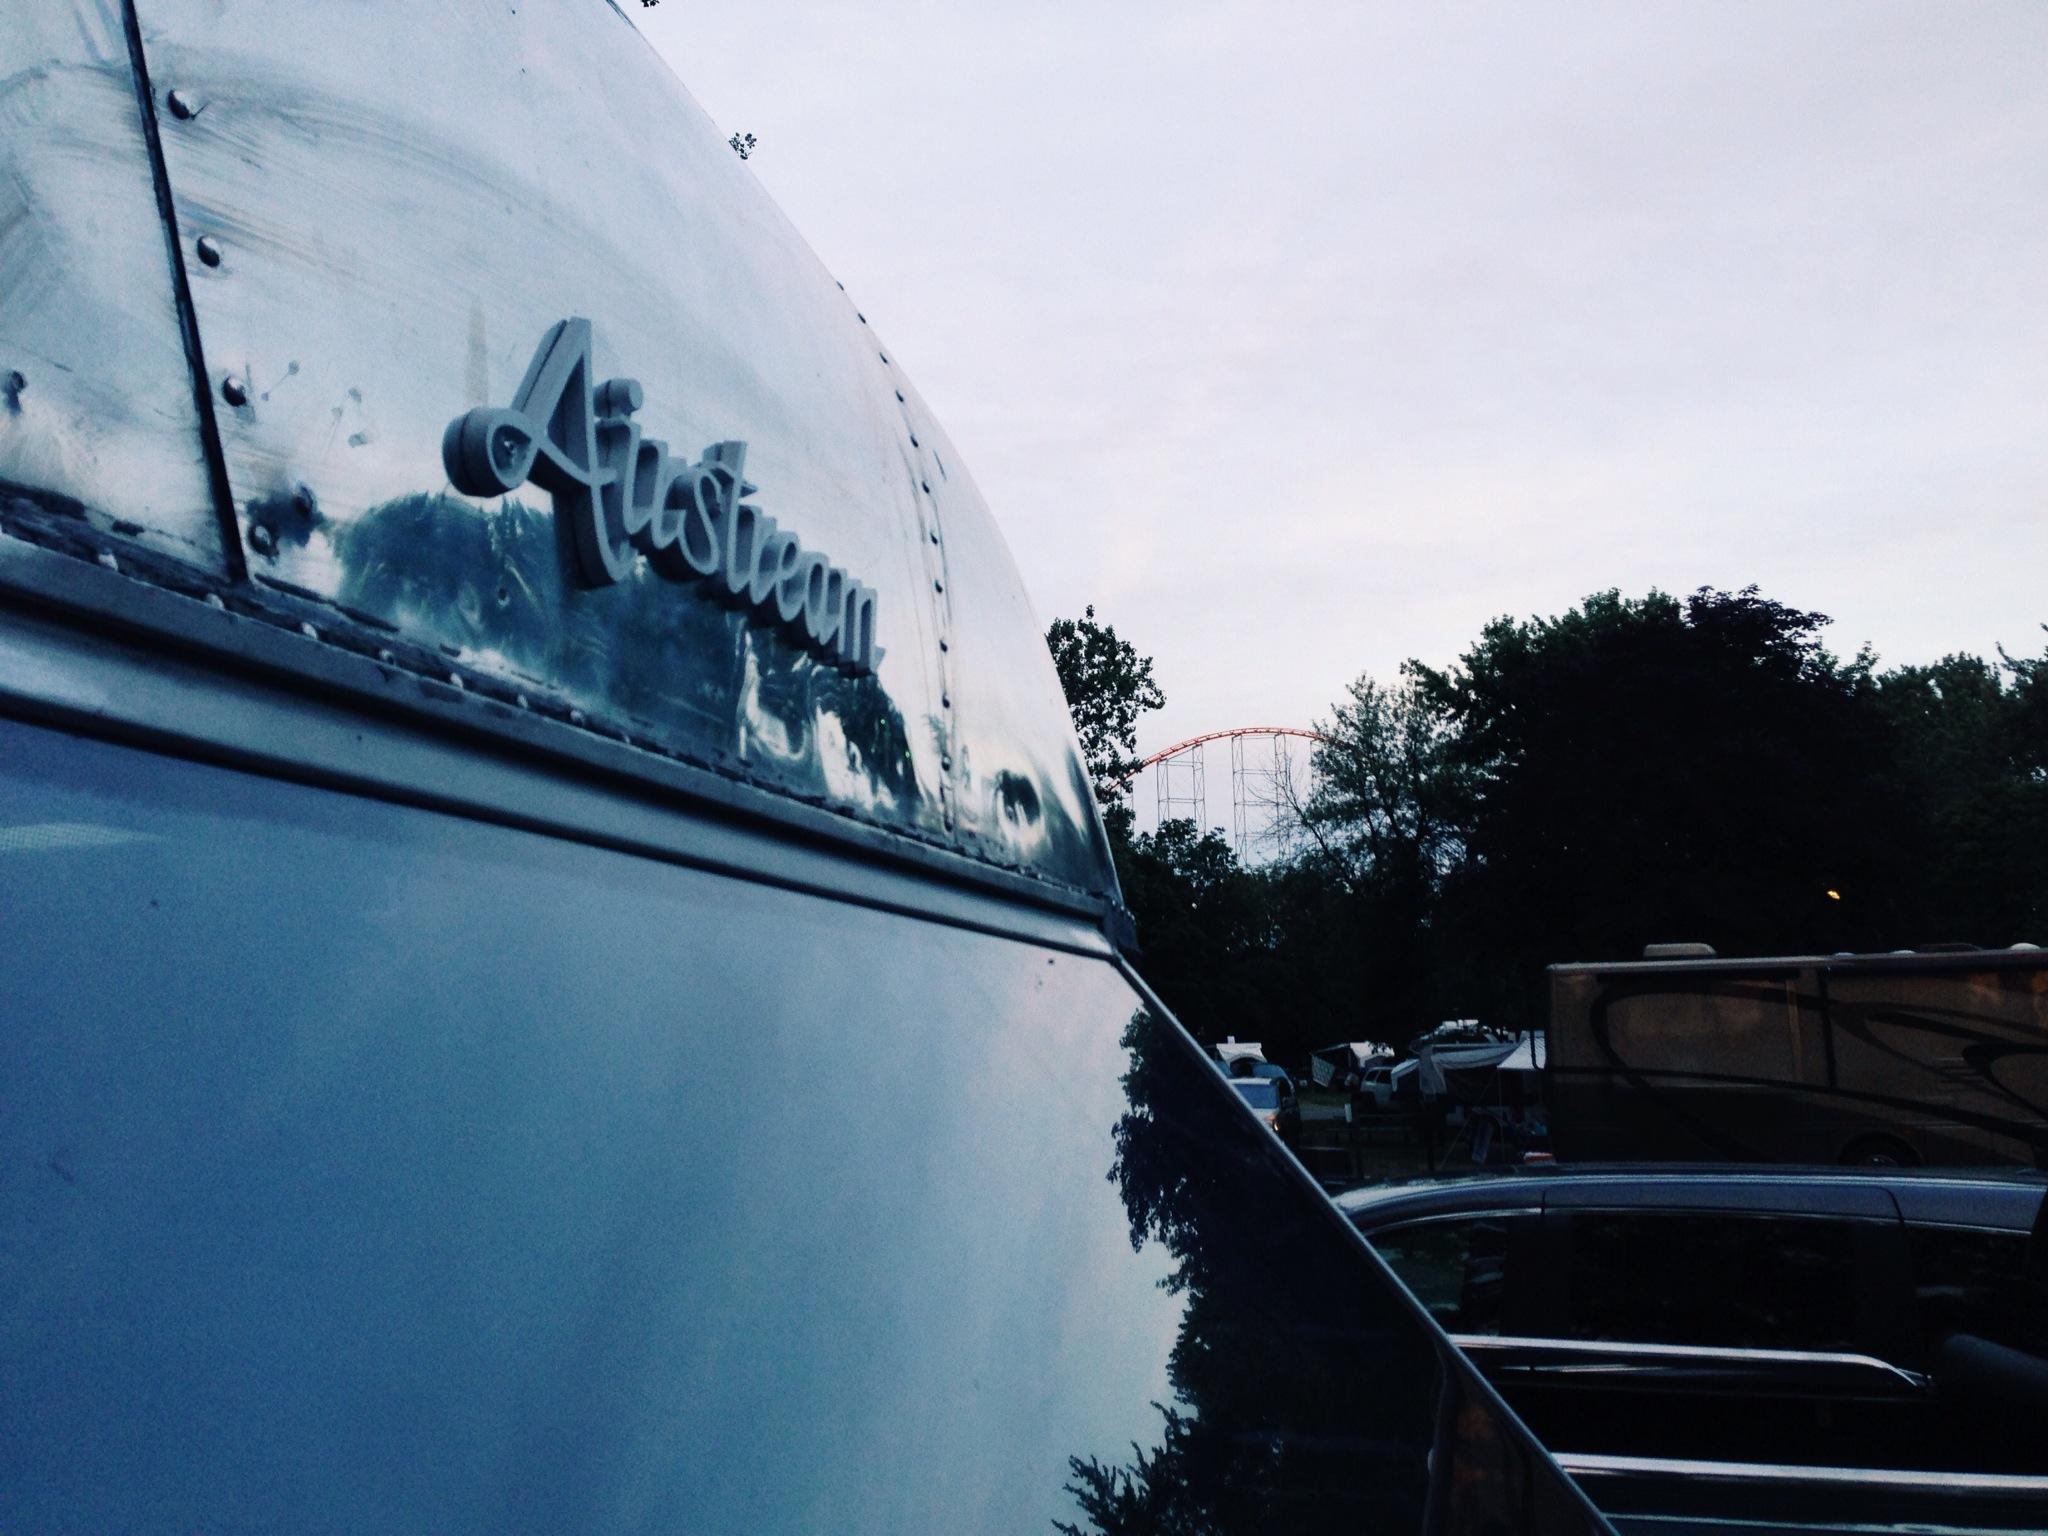 Parking the Airstream under the Magnum XL 200